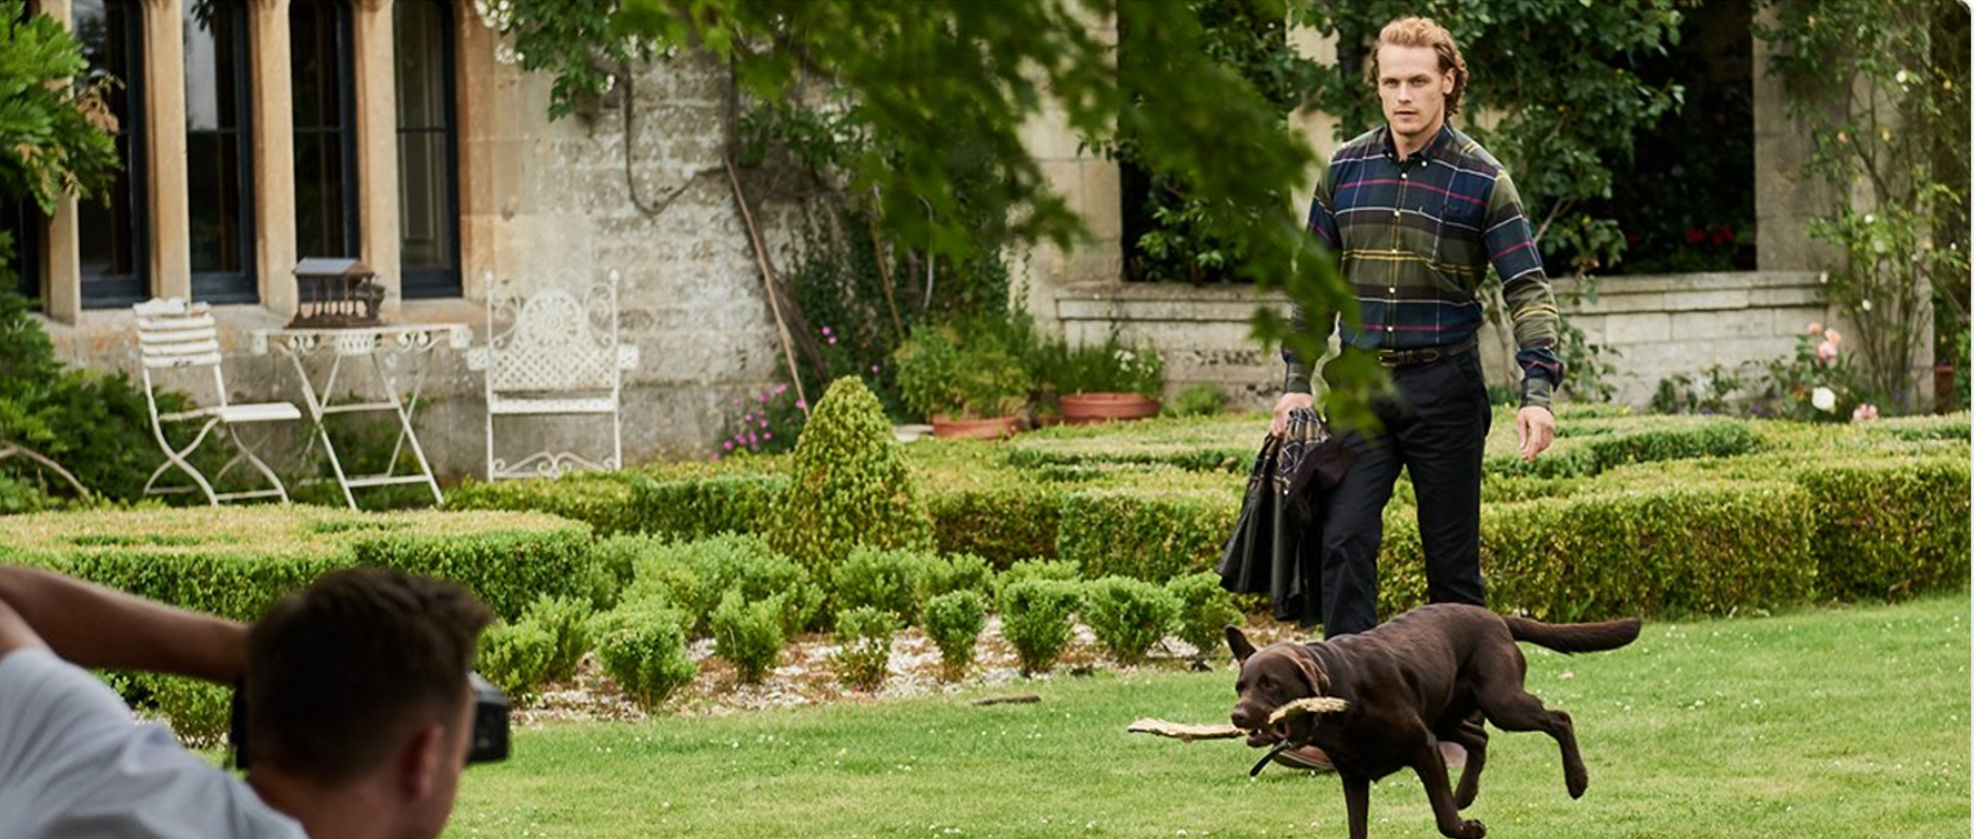 Outlander Star Unveiled as Barbour's First Global Brand Ambassador